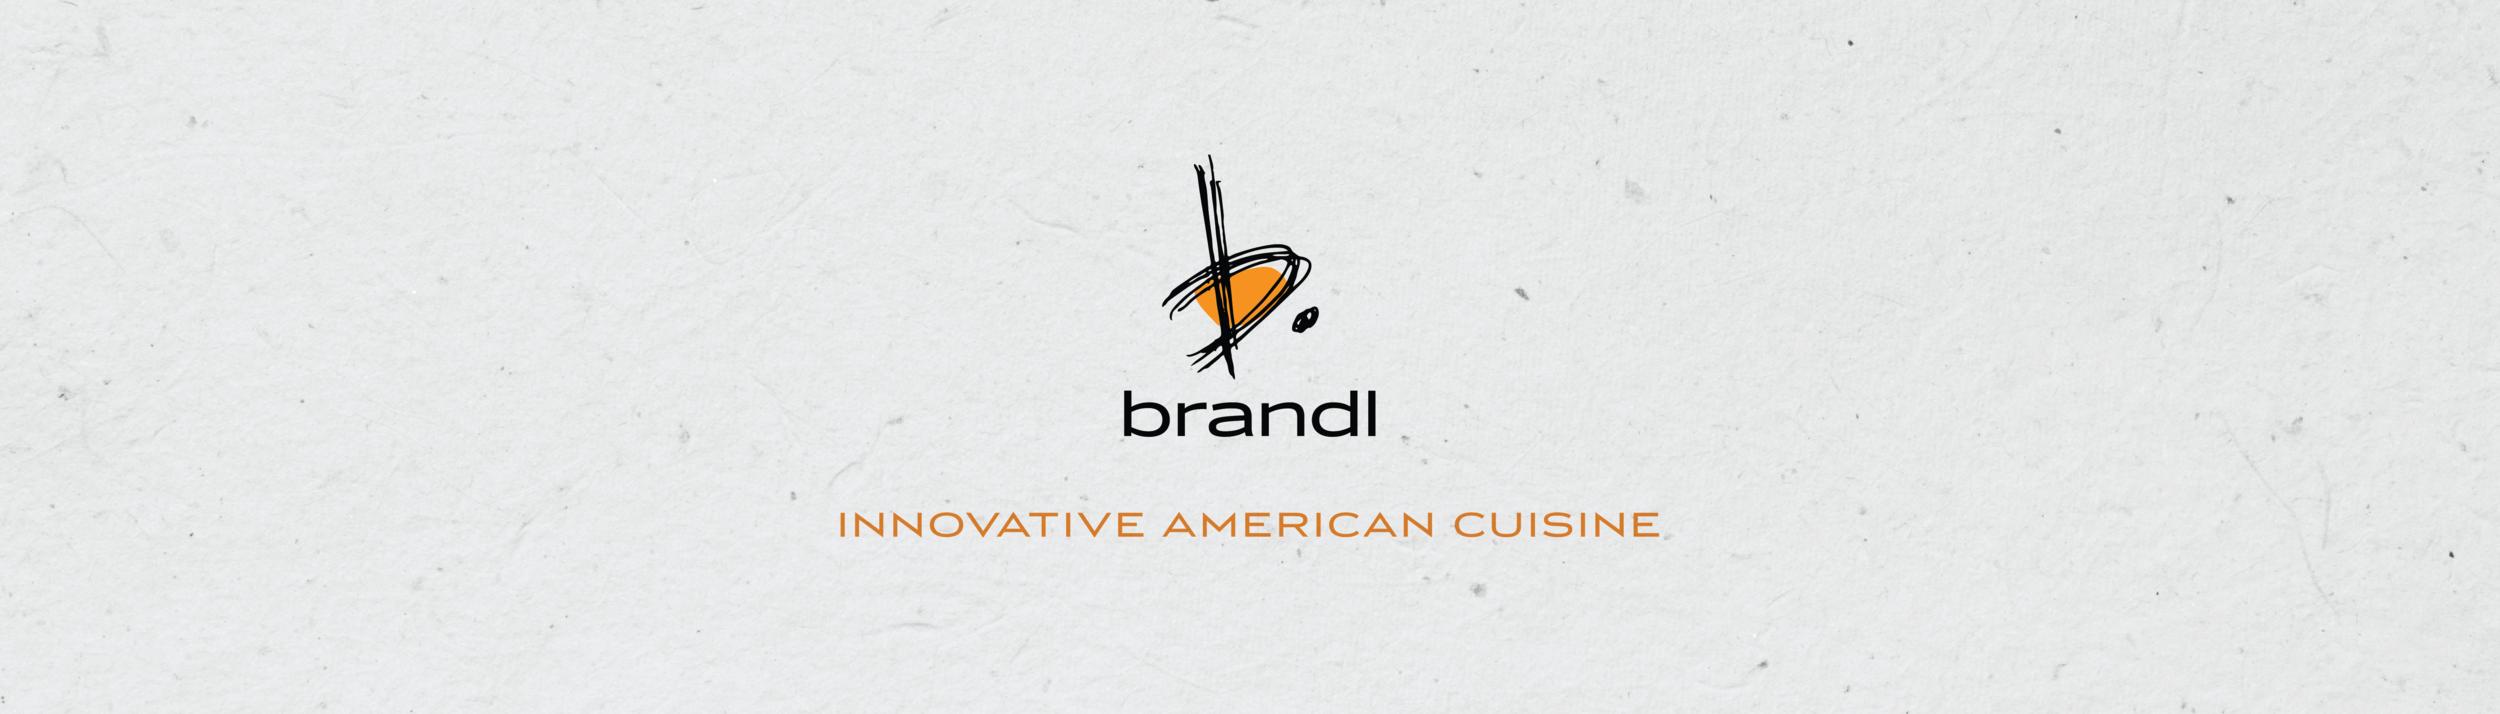 Grass Brandl logo-01.png